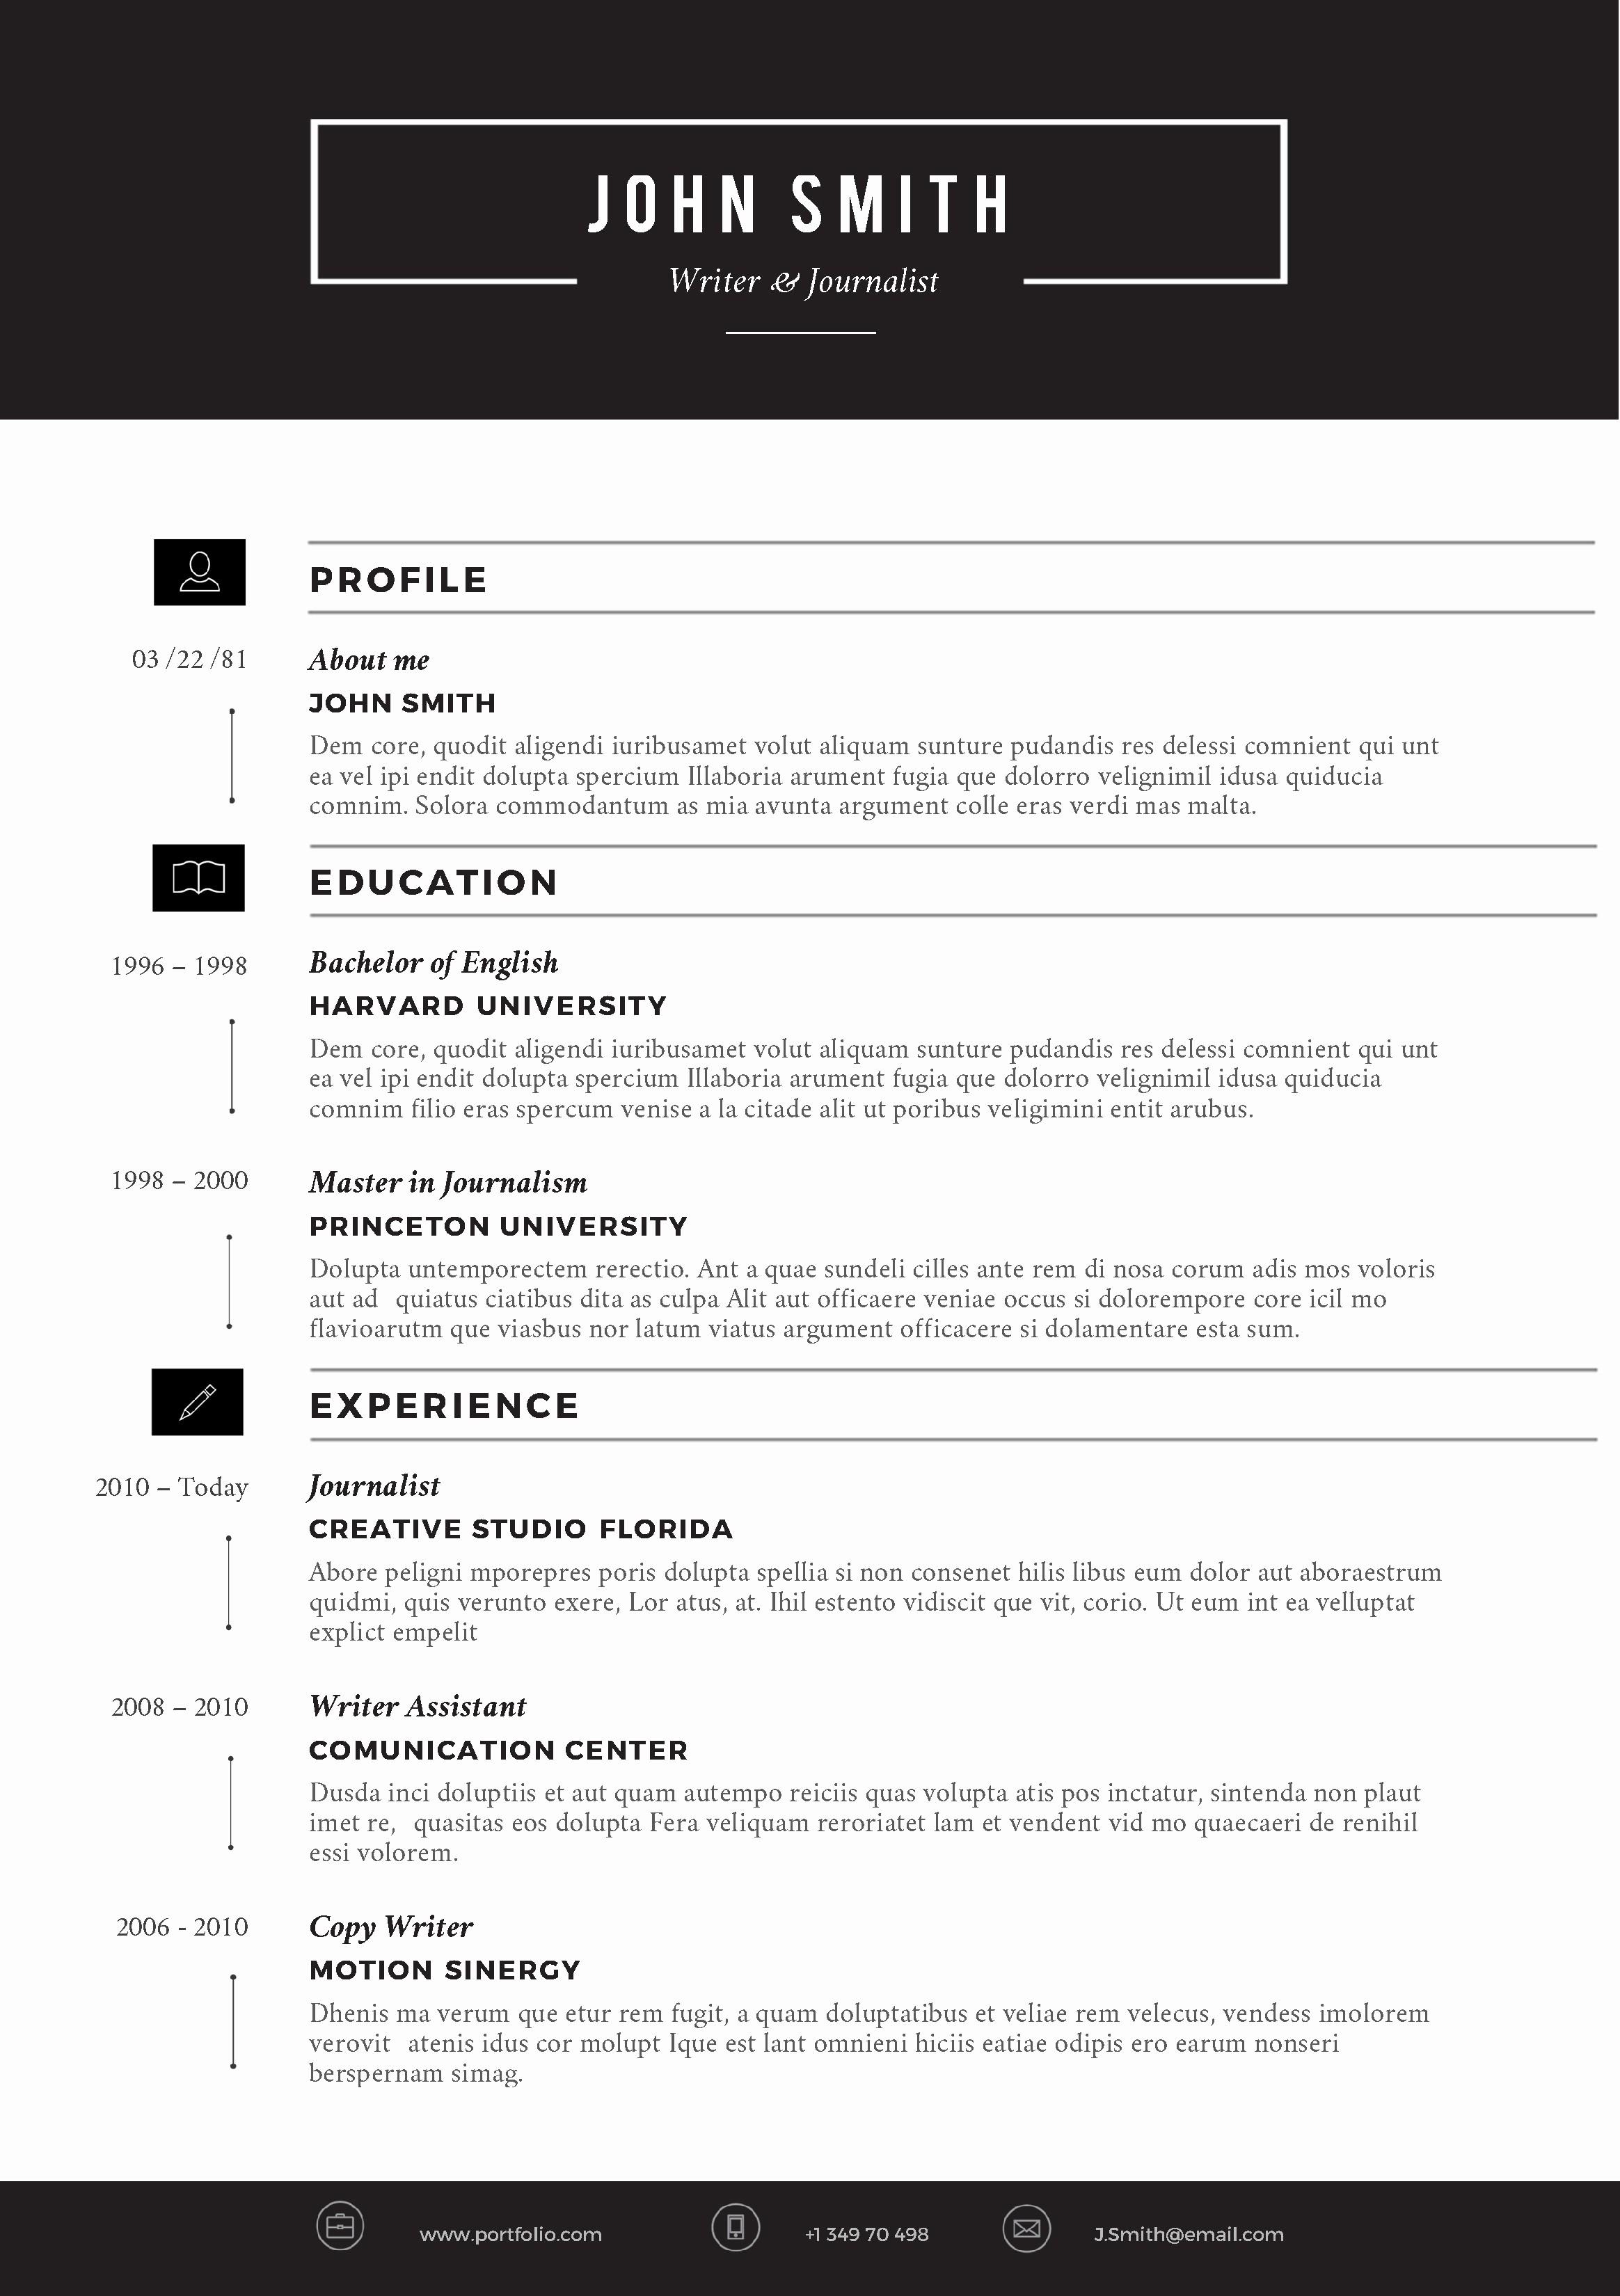 Download Microsoft Word Resume Template Luxury Creative Resume Template by Cvfolio Resumes